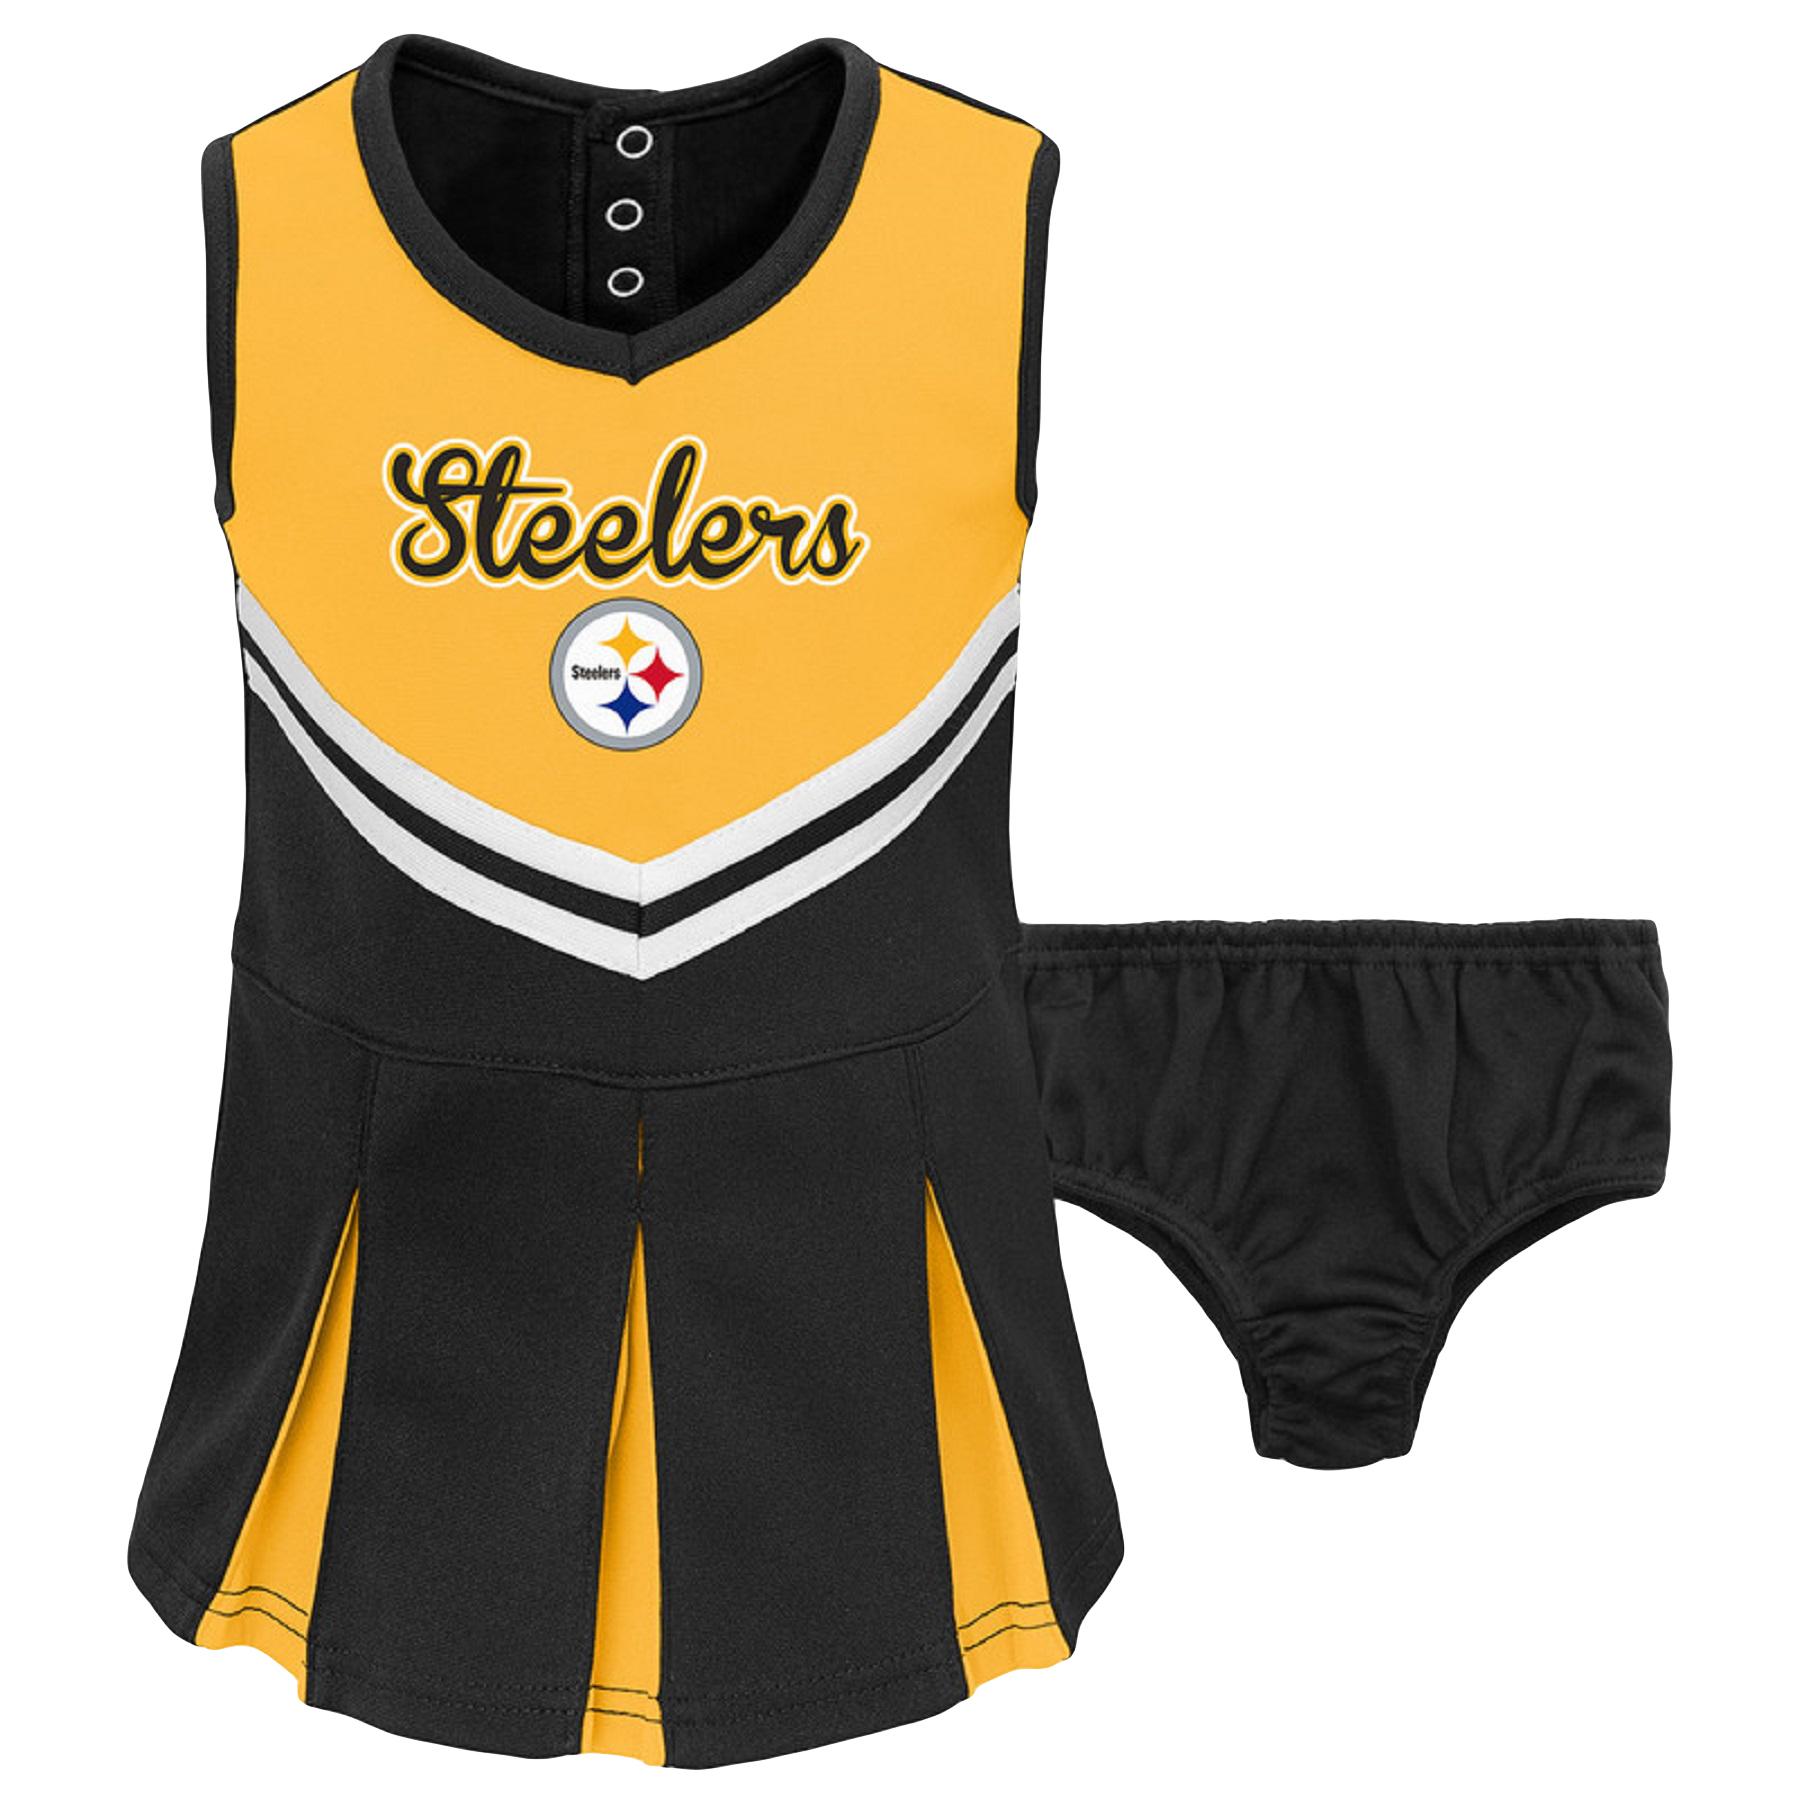 Infant Gold/Black Pittsburgh Steelers Cheerleader Dress & Bloomers Set